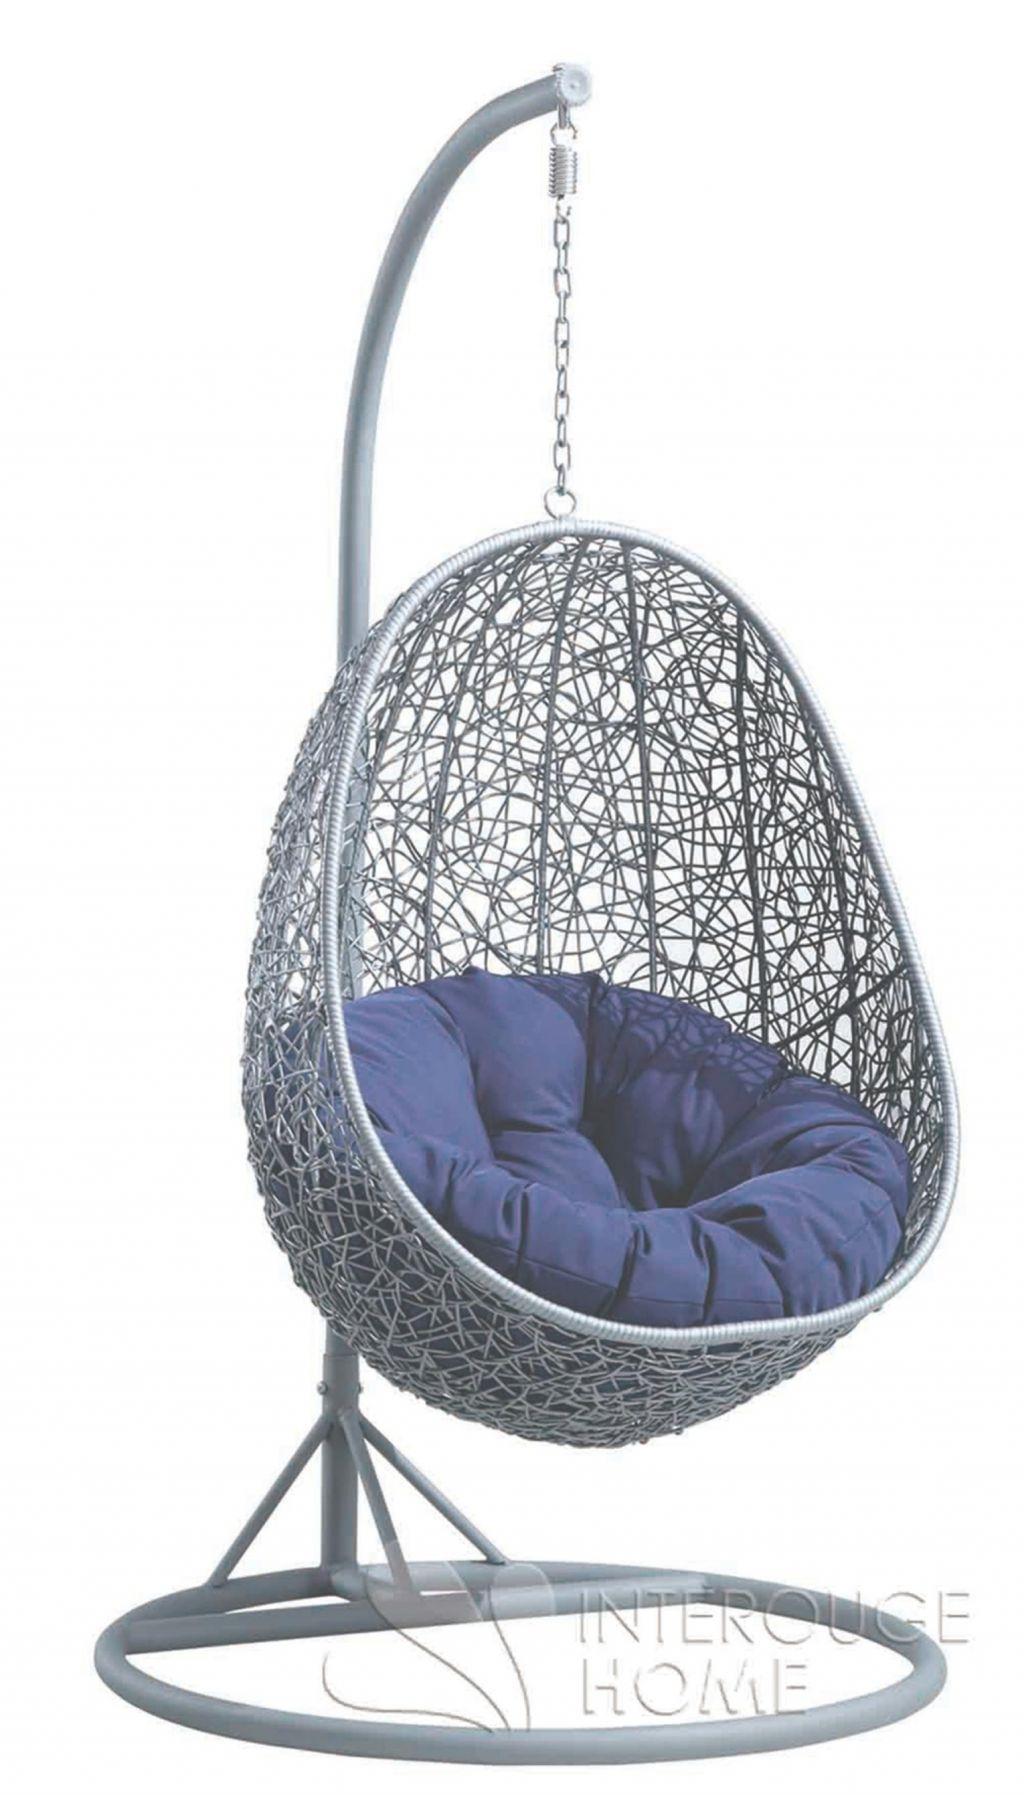 Housse Bz Gifi Beau Collection Matelas Design Hypnotisant Matelas Pneumatique Gifi élégant Gifi